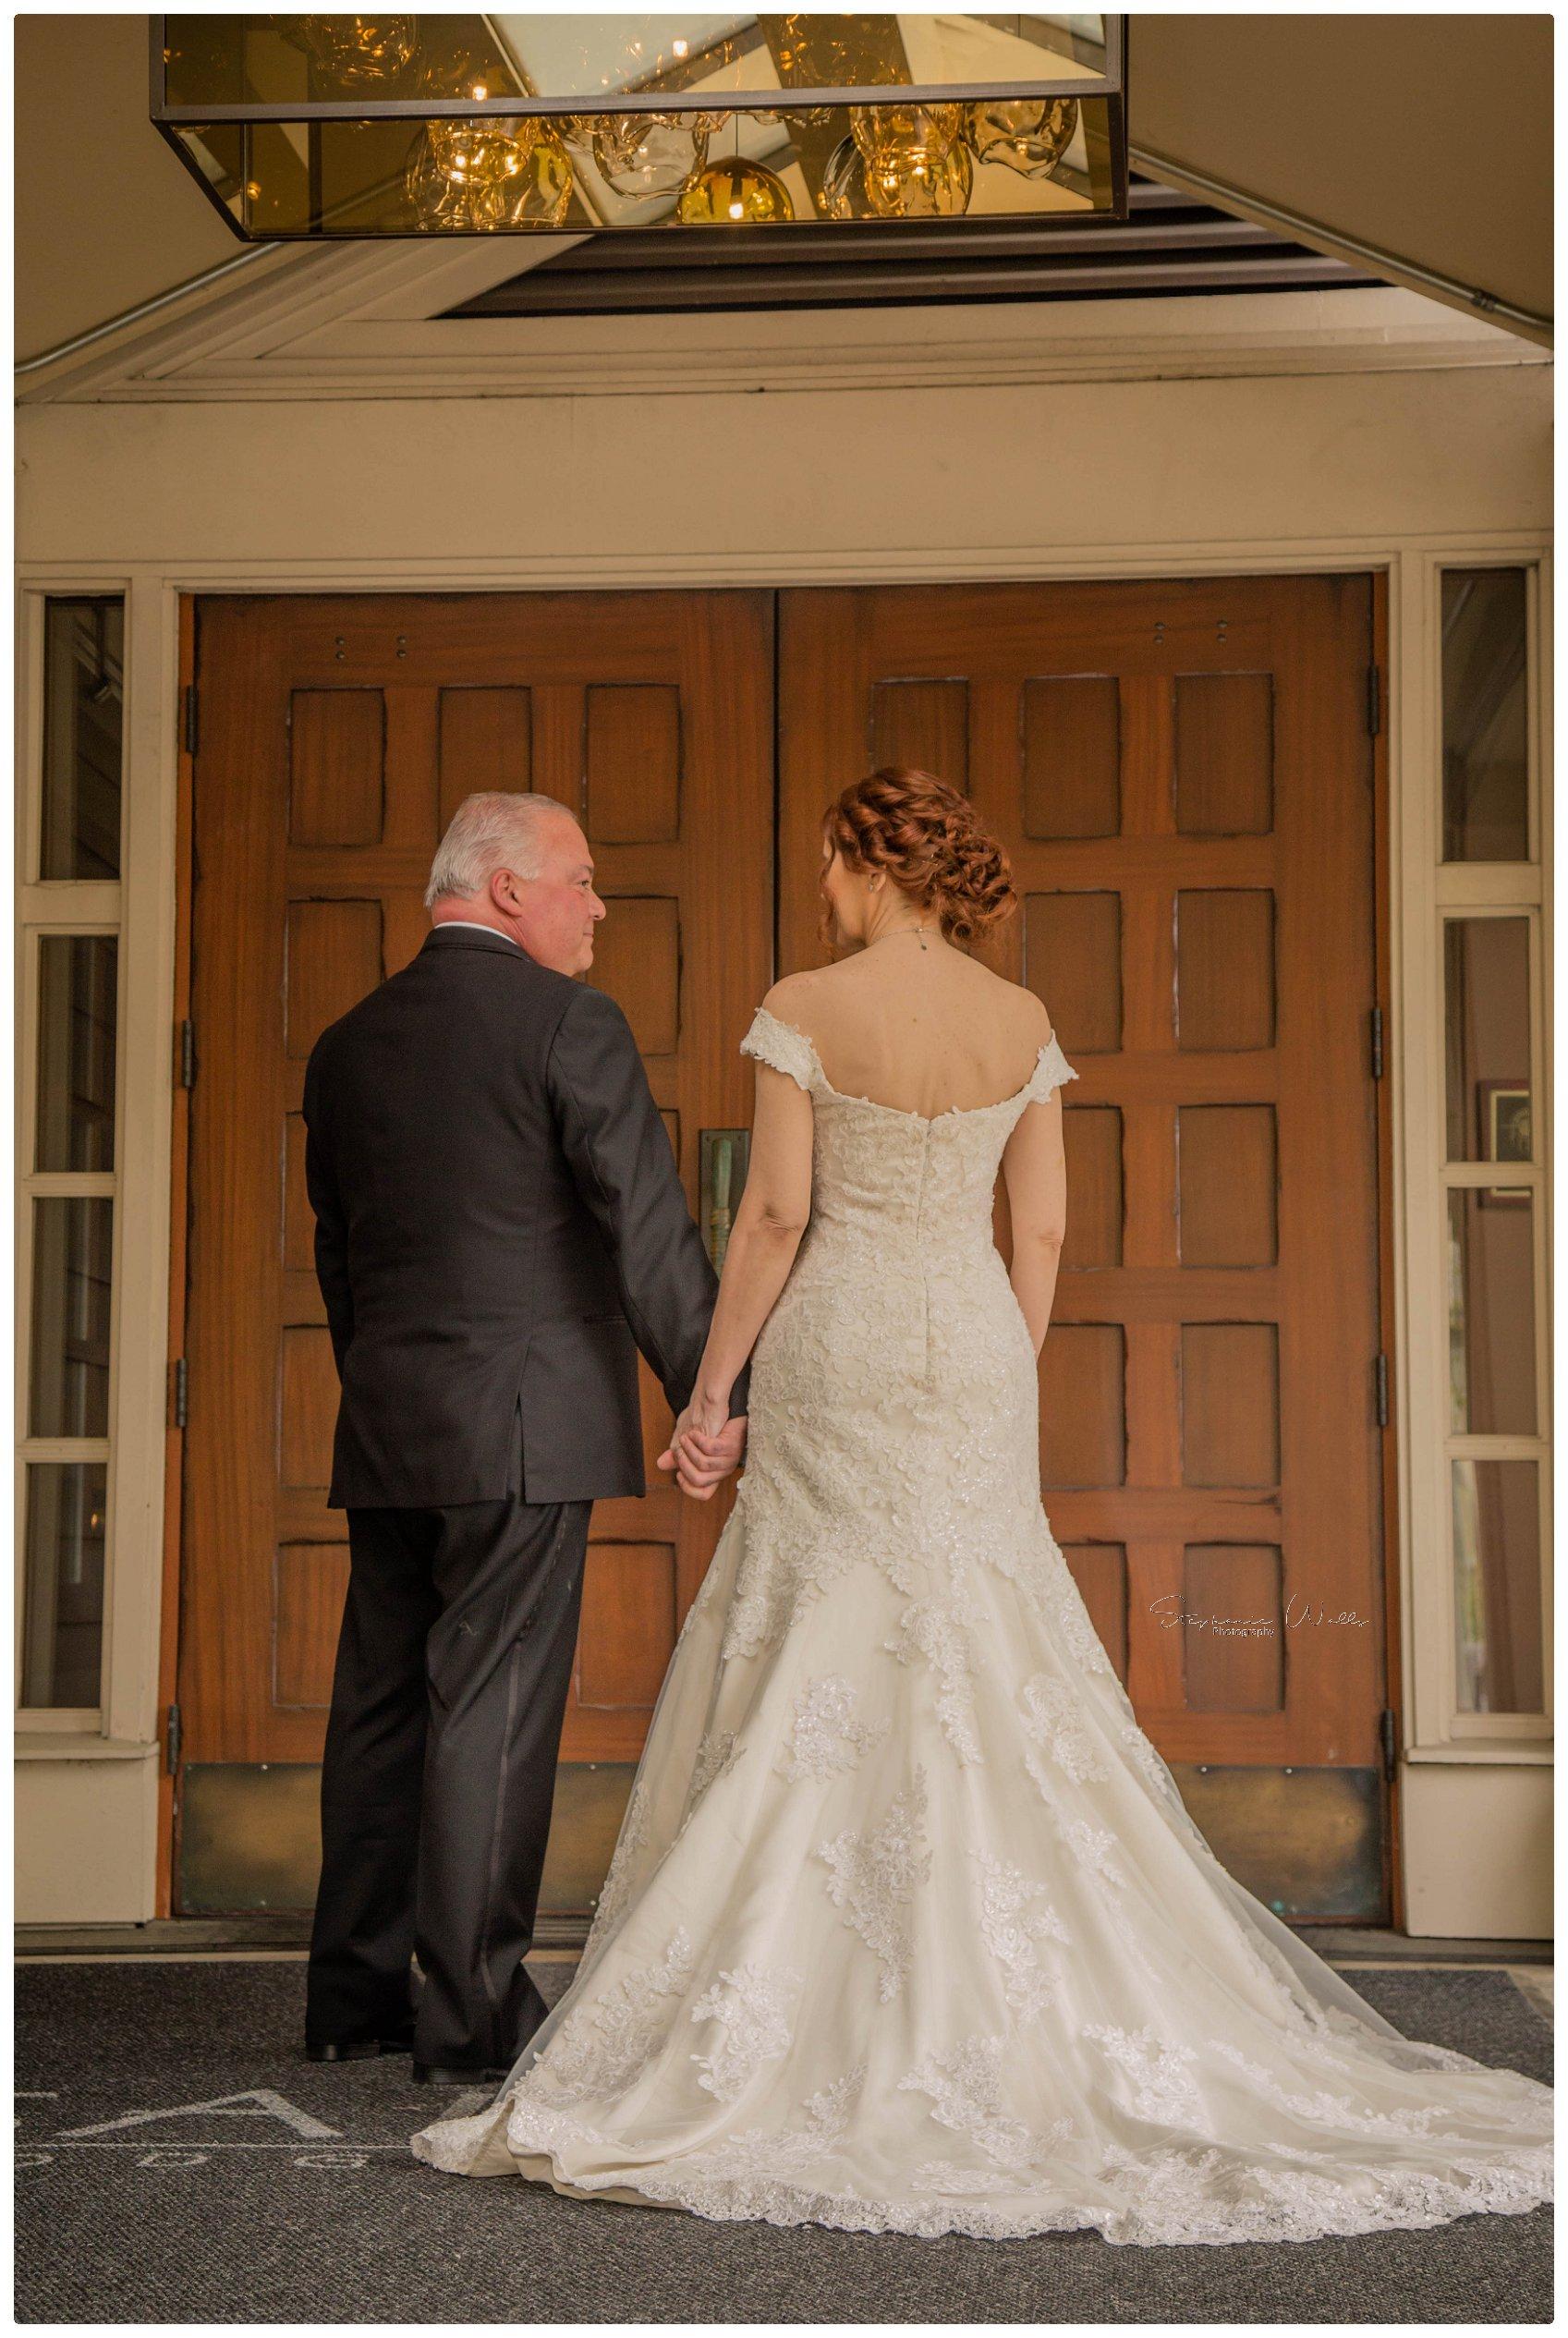 Portraits Ceremony 007 Salish Lodge & Spa    Elopement With Liz and Paul